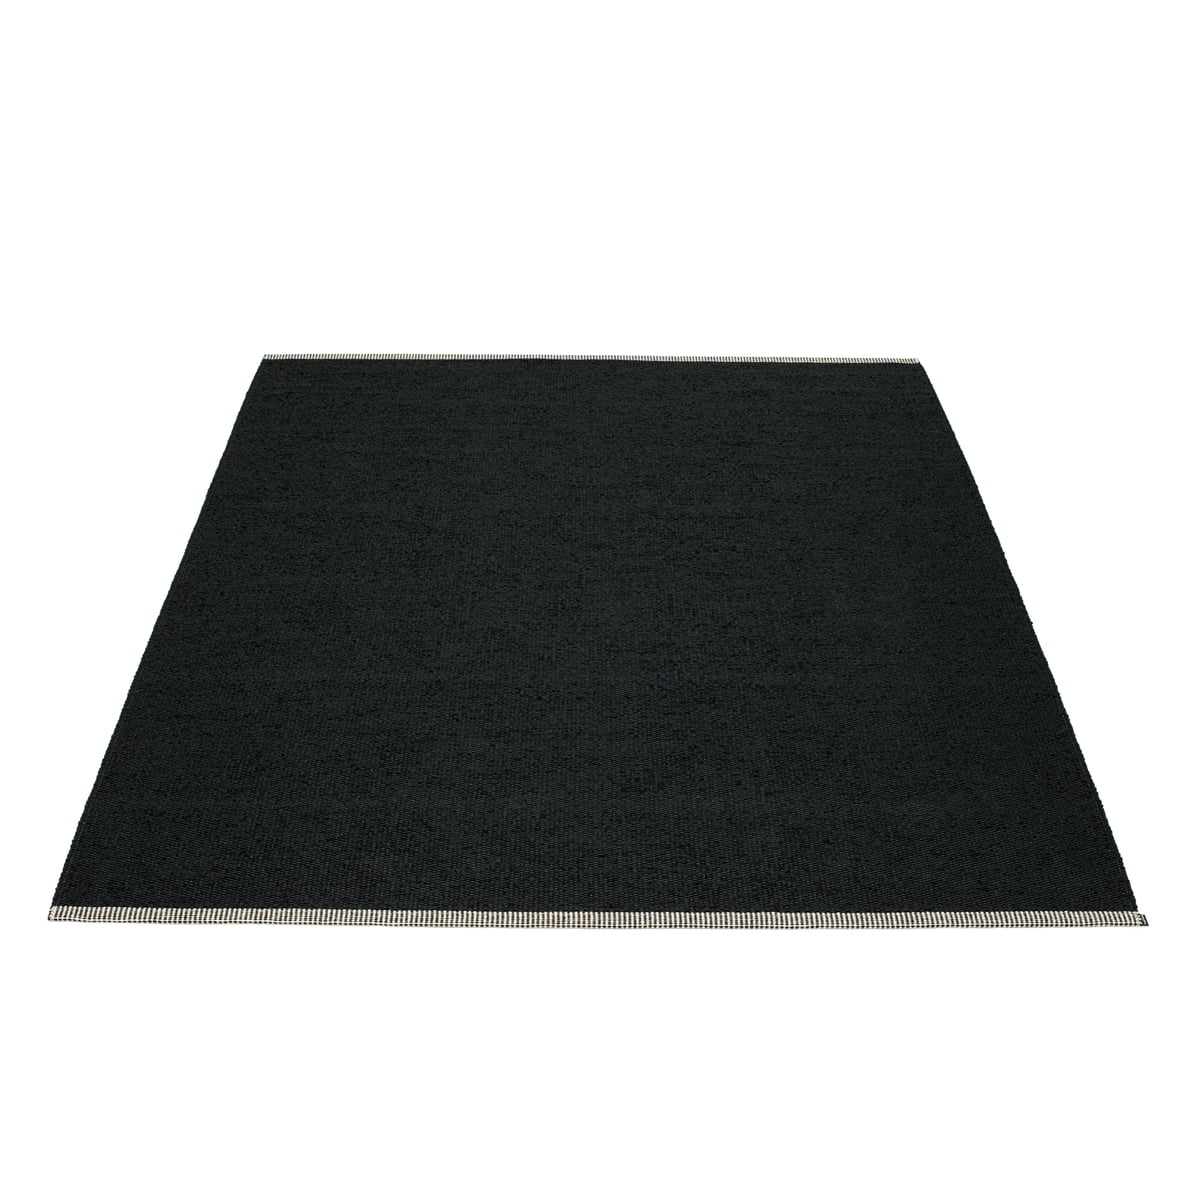 mono teppich 180 cm von pappelina. Black Bedroom Furniture Sets. Home Design Ideas